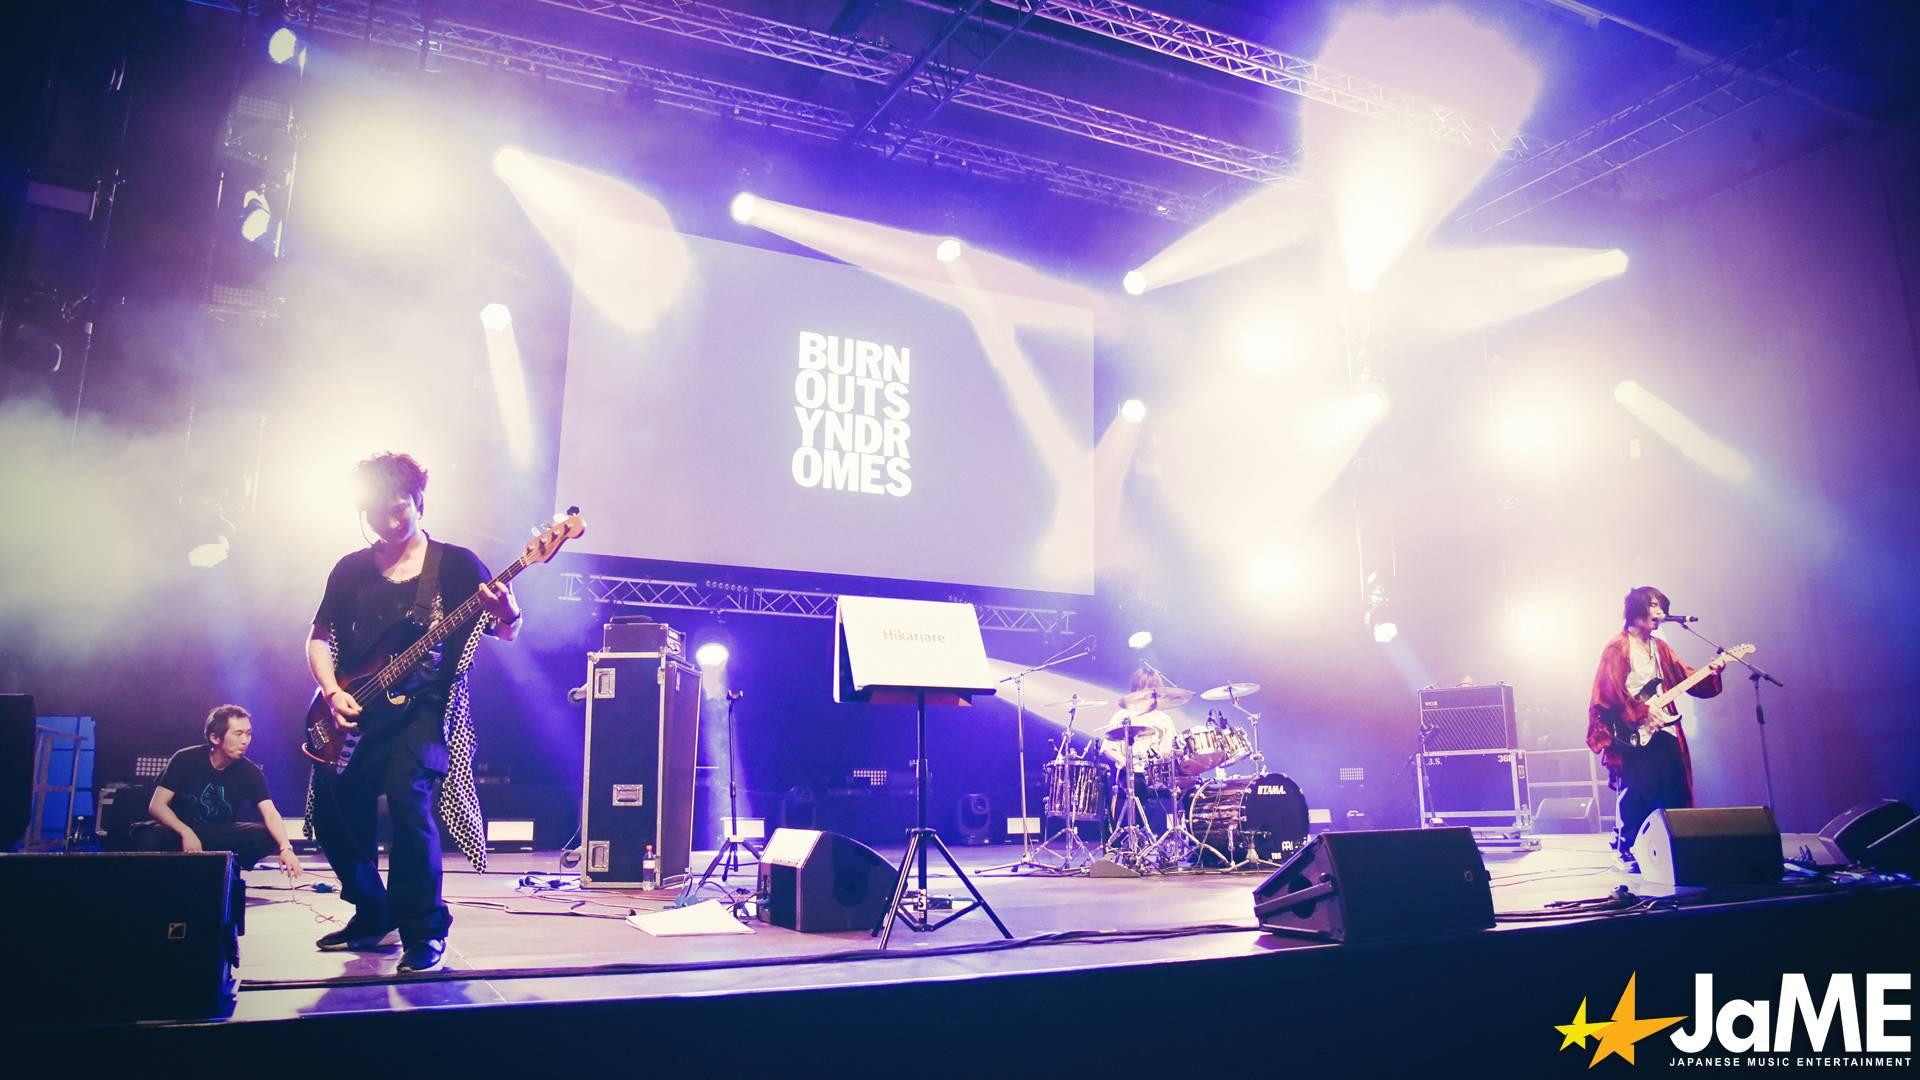 BURNOUT SYNDROMES live auf der Animesse Berlin 2019